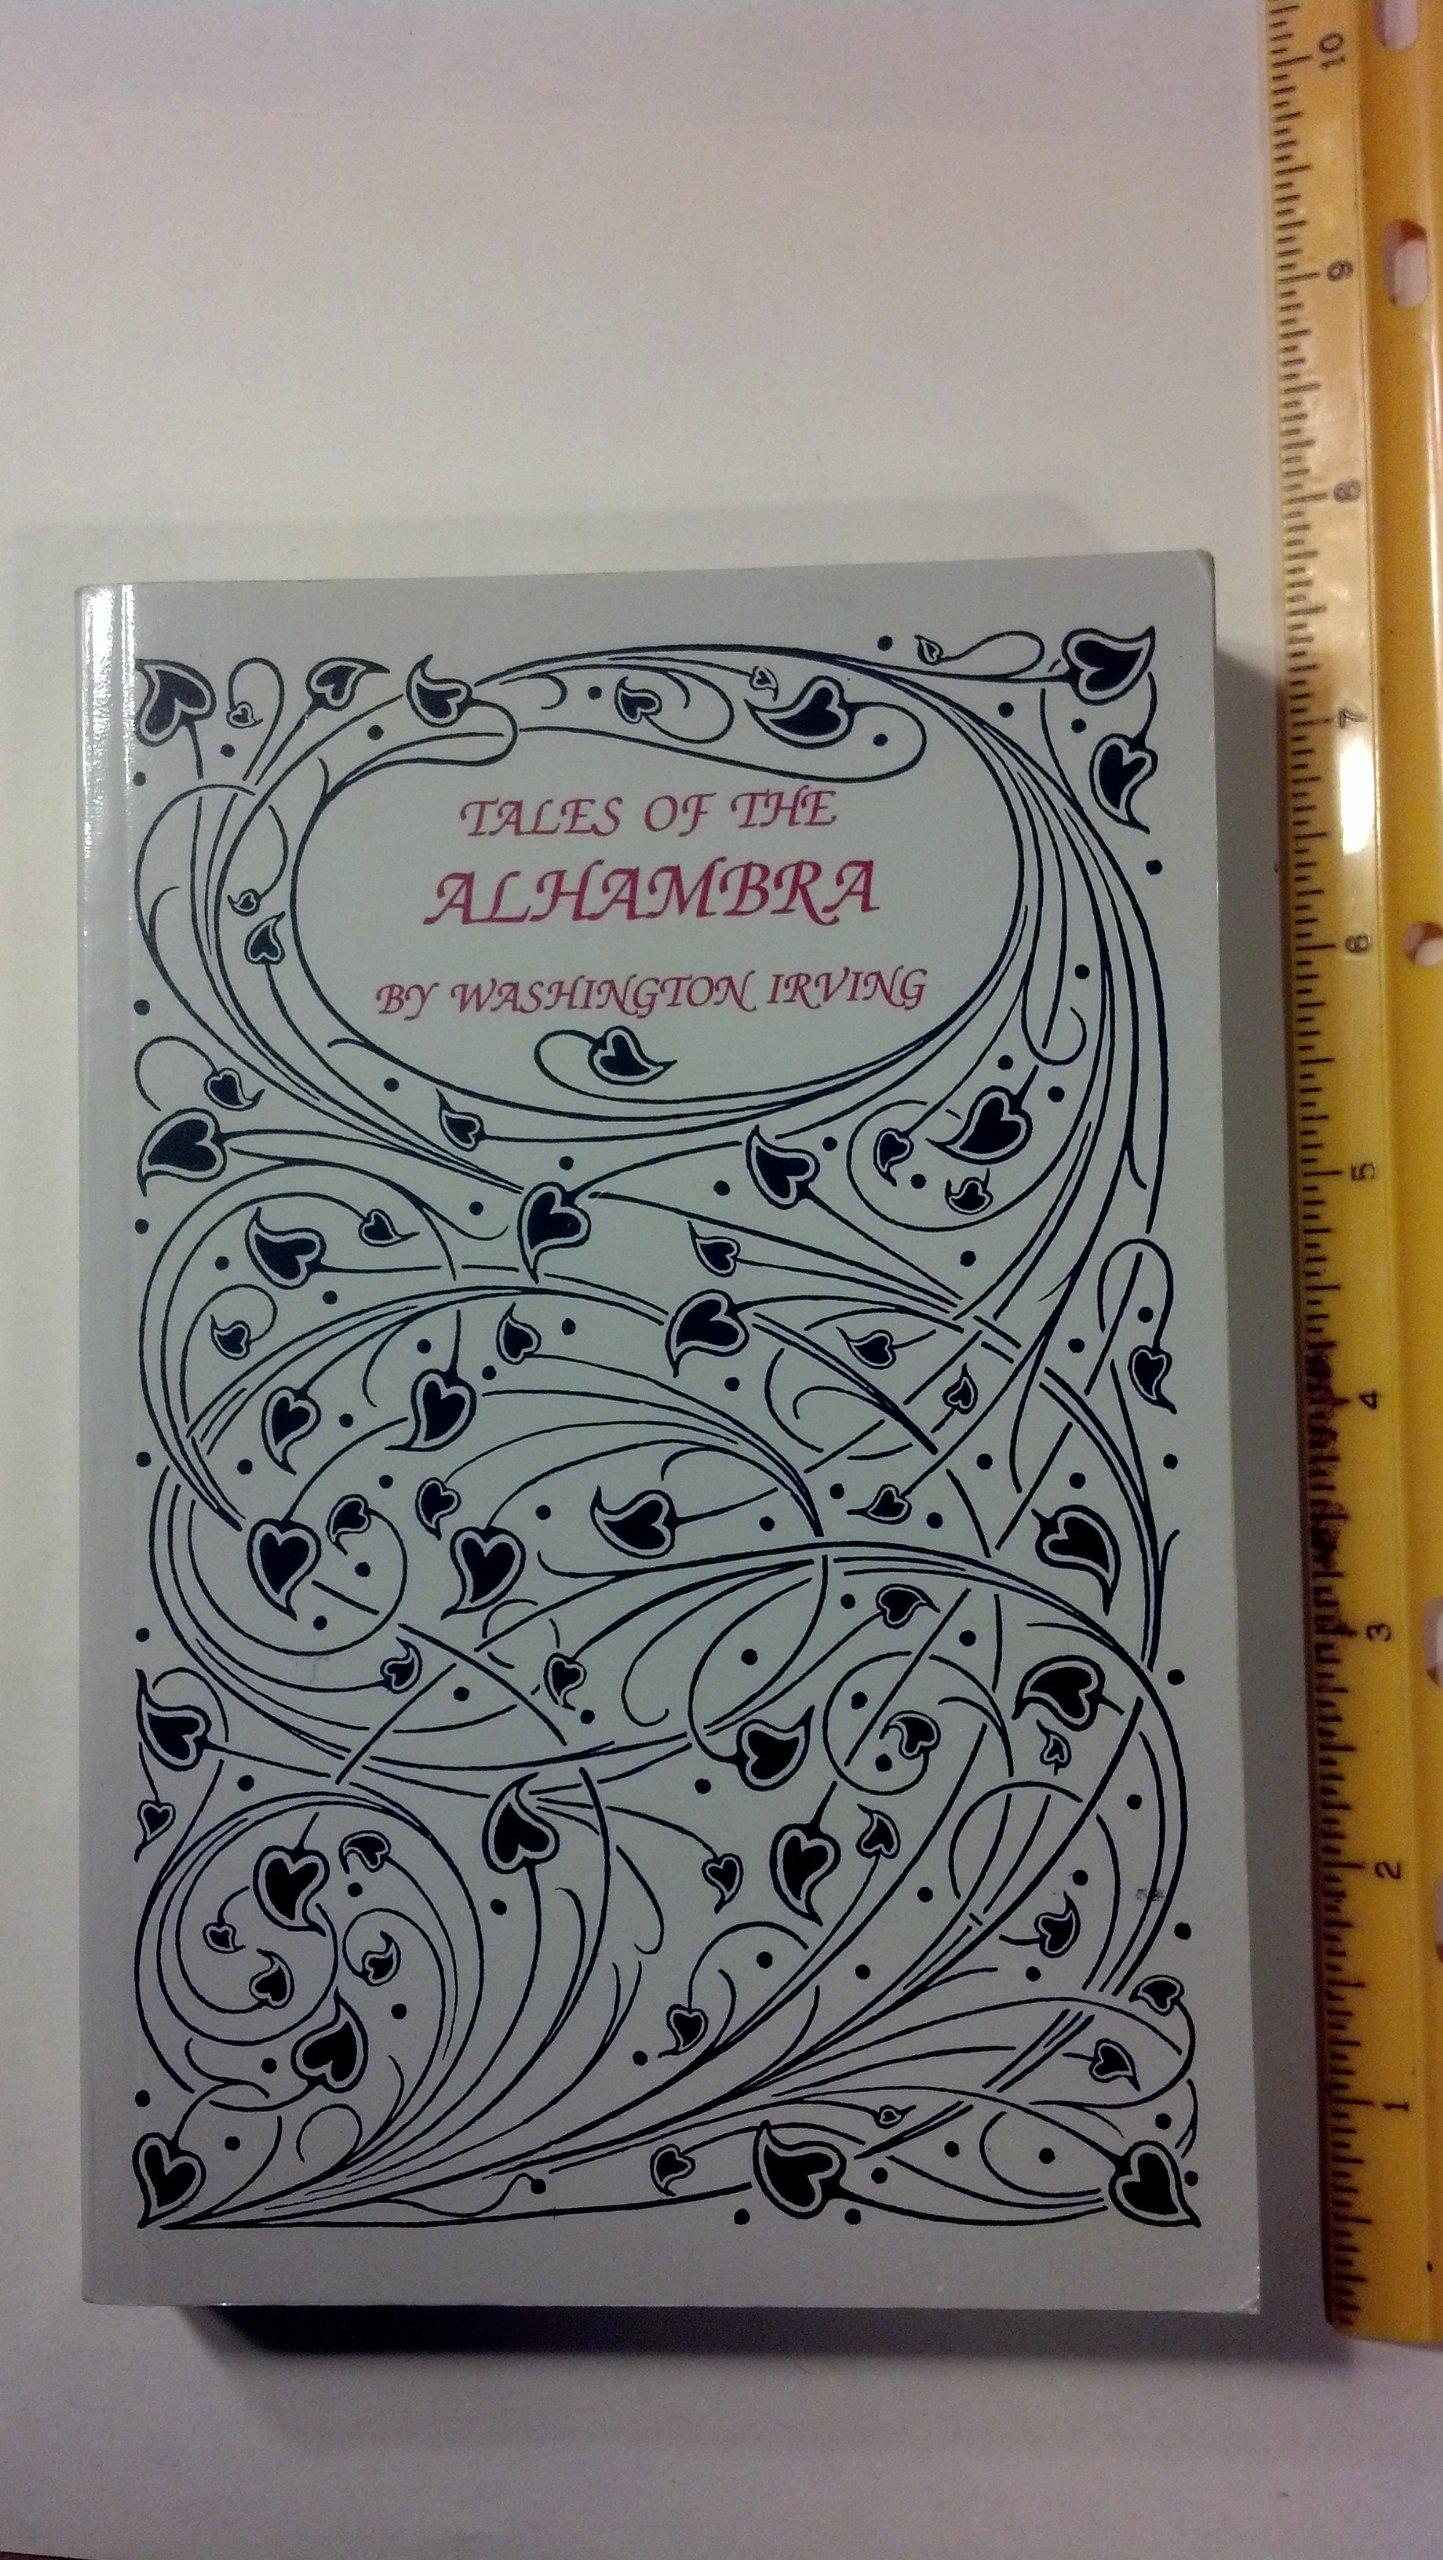 Tales of the Alhambra: Washington Irving, Elizabeth Pennell: Amazon.com:  Books